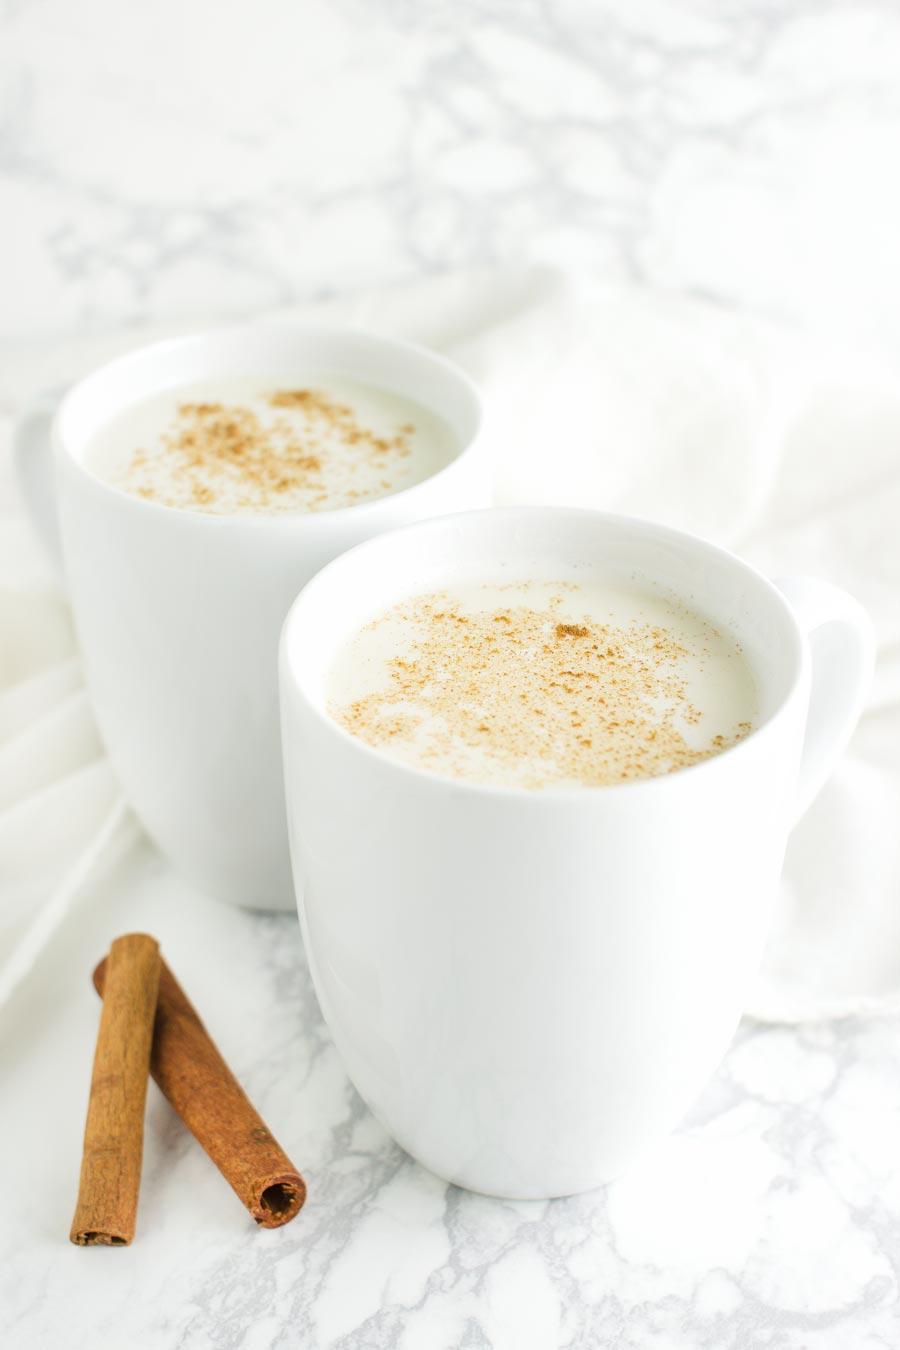 Vanilla Coconut Milk recipe from acleanplate.com #paleo #aip #autoimmuneprotocol